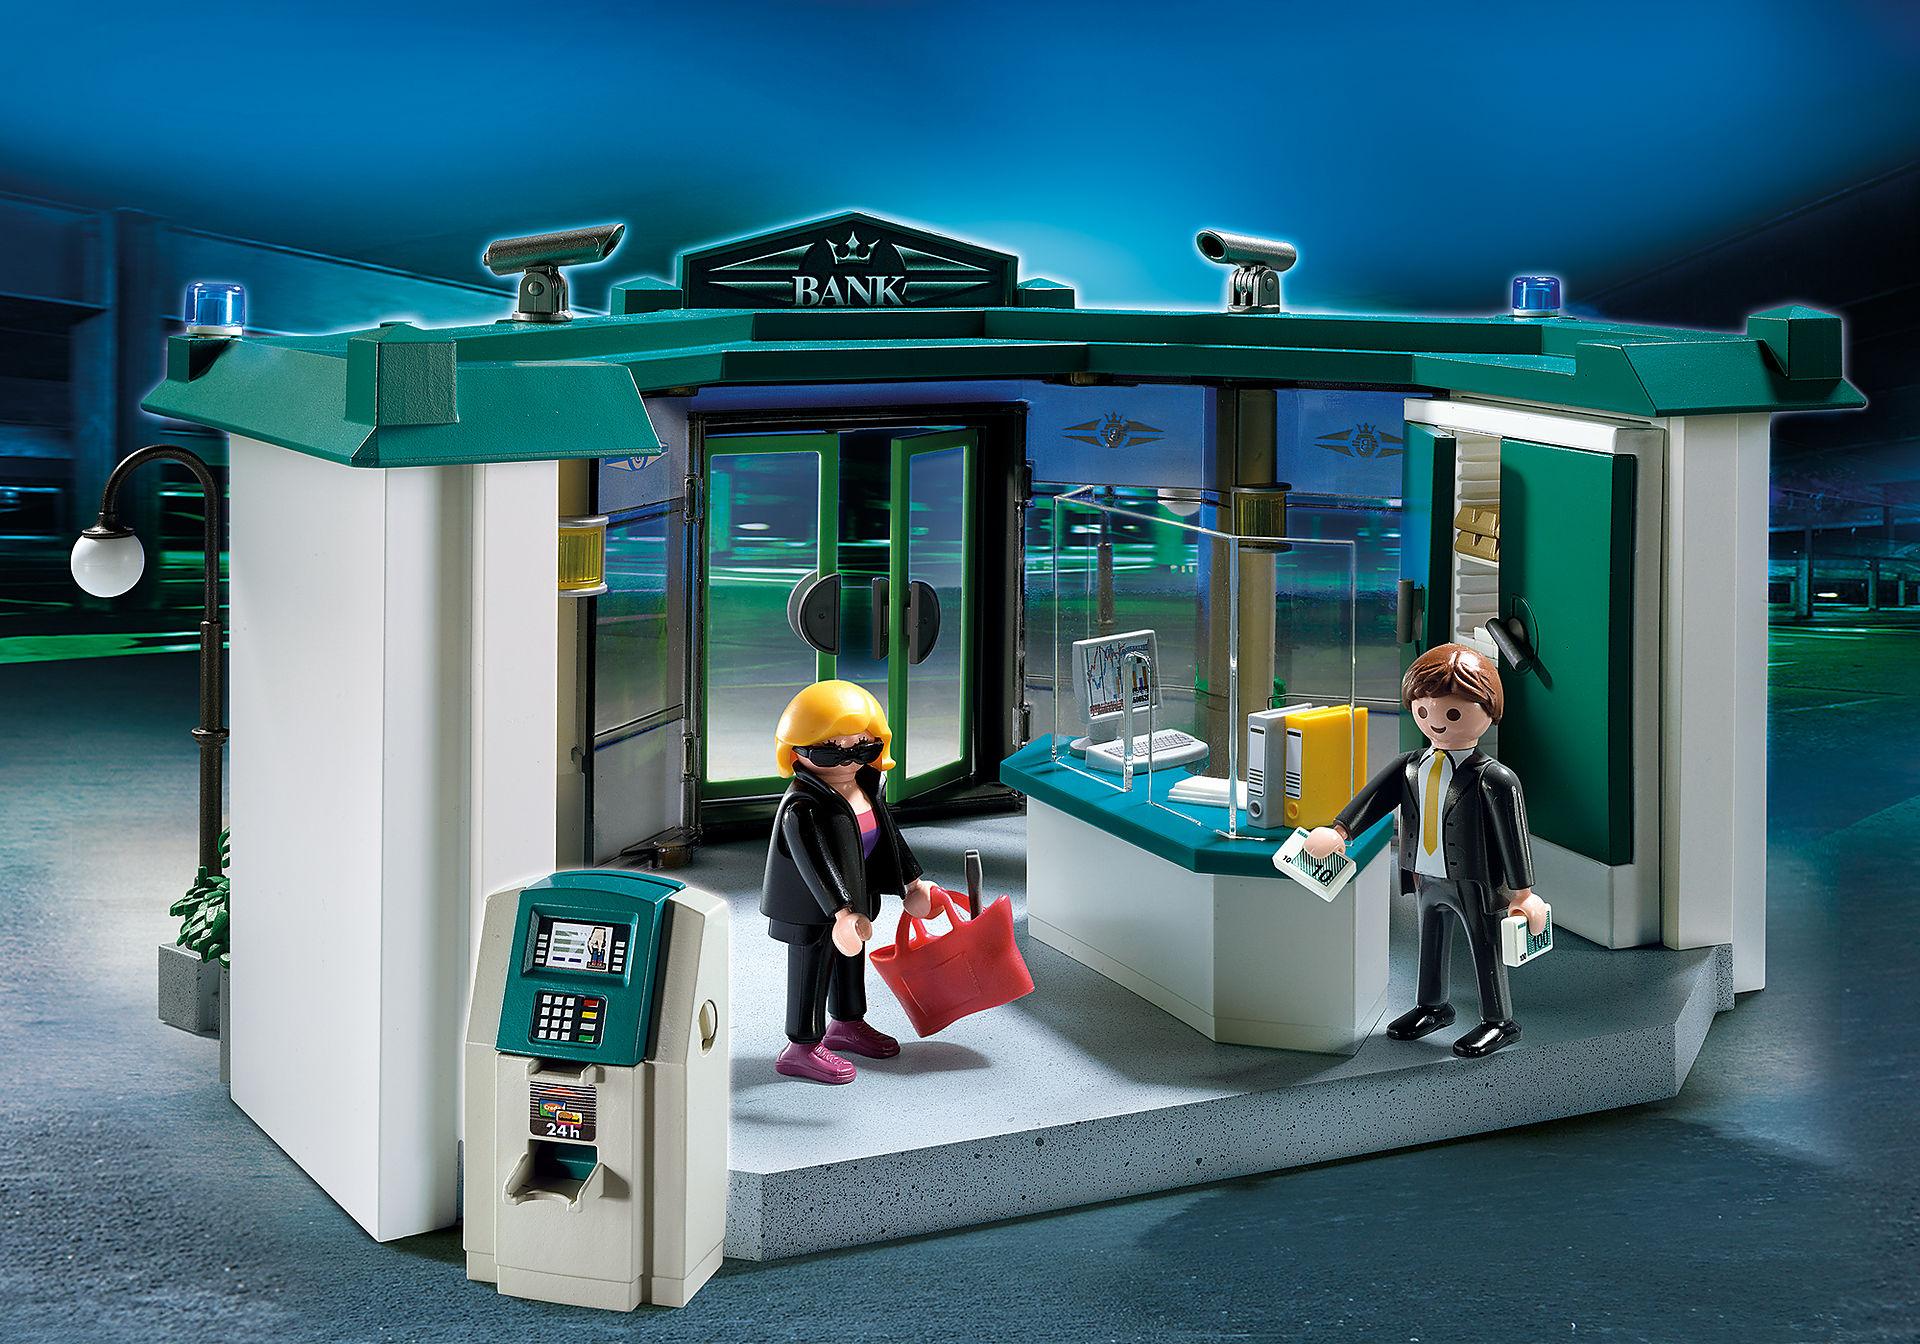 5177-A Bank mit Geldautomat zoom image1